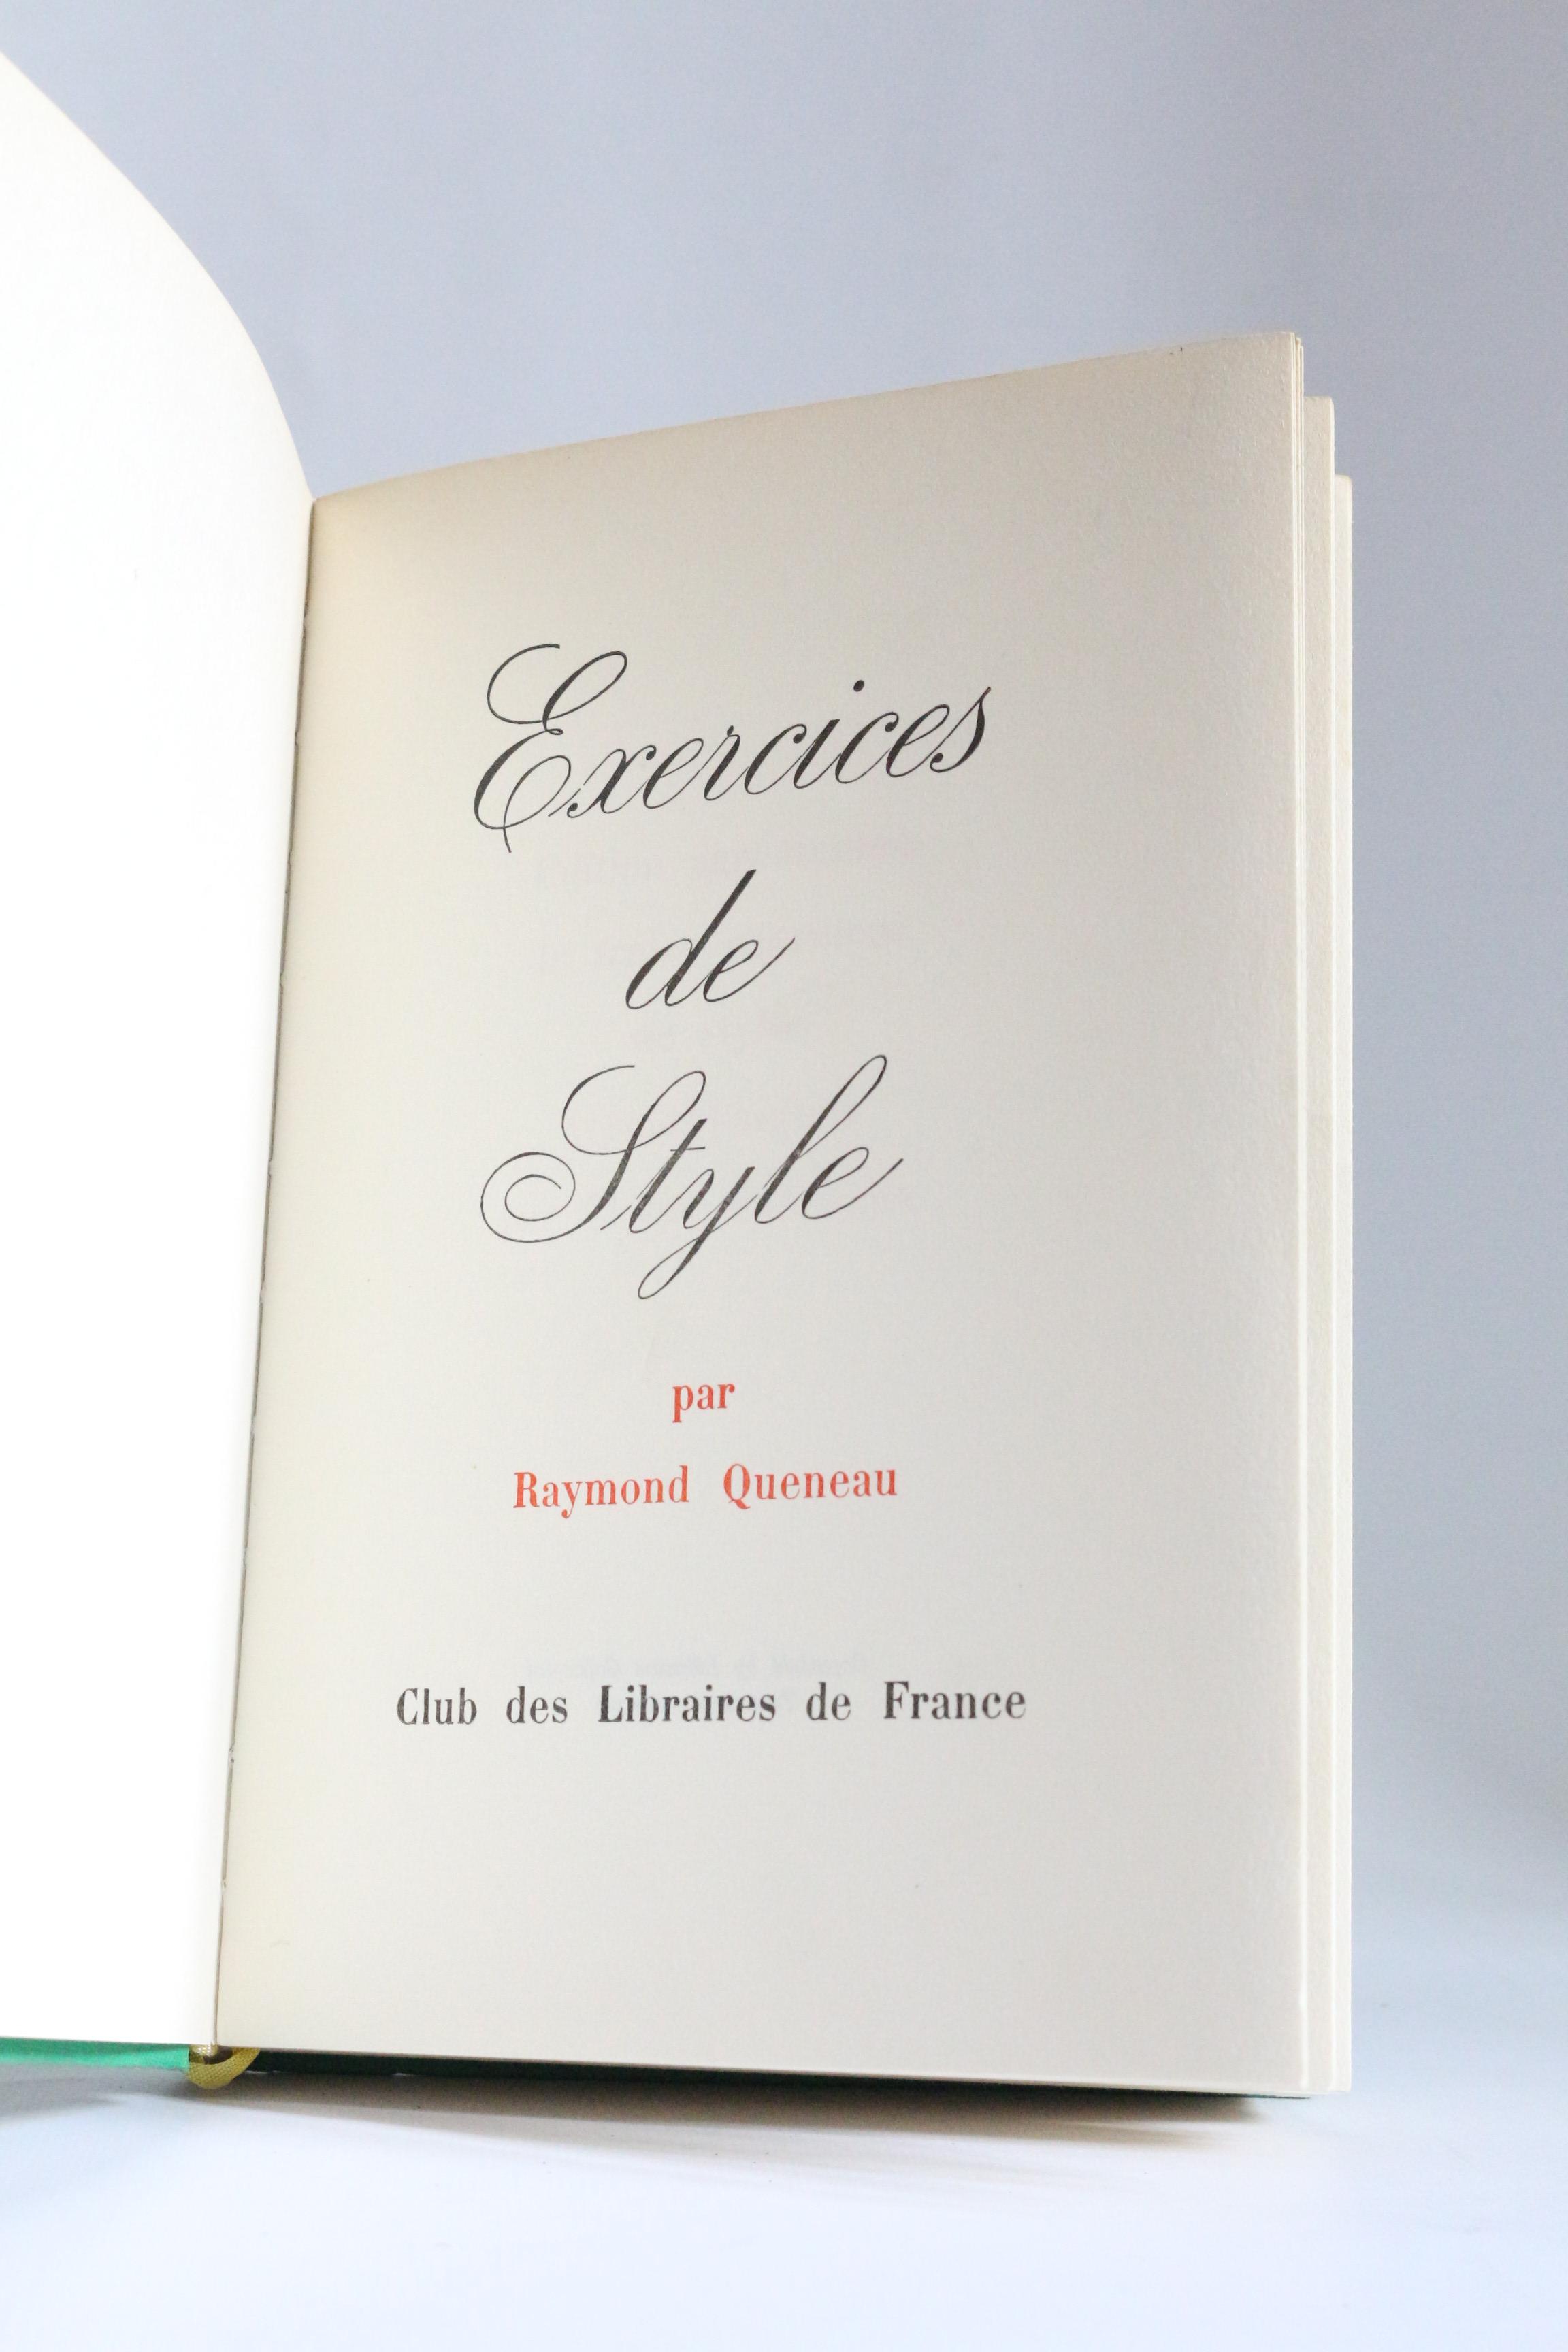 Exercices de style by QUENEAU Raymond: Couverture rigide ...